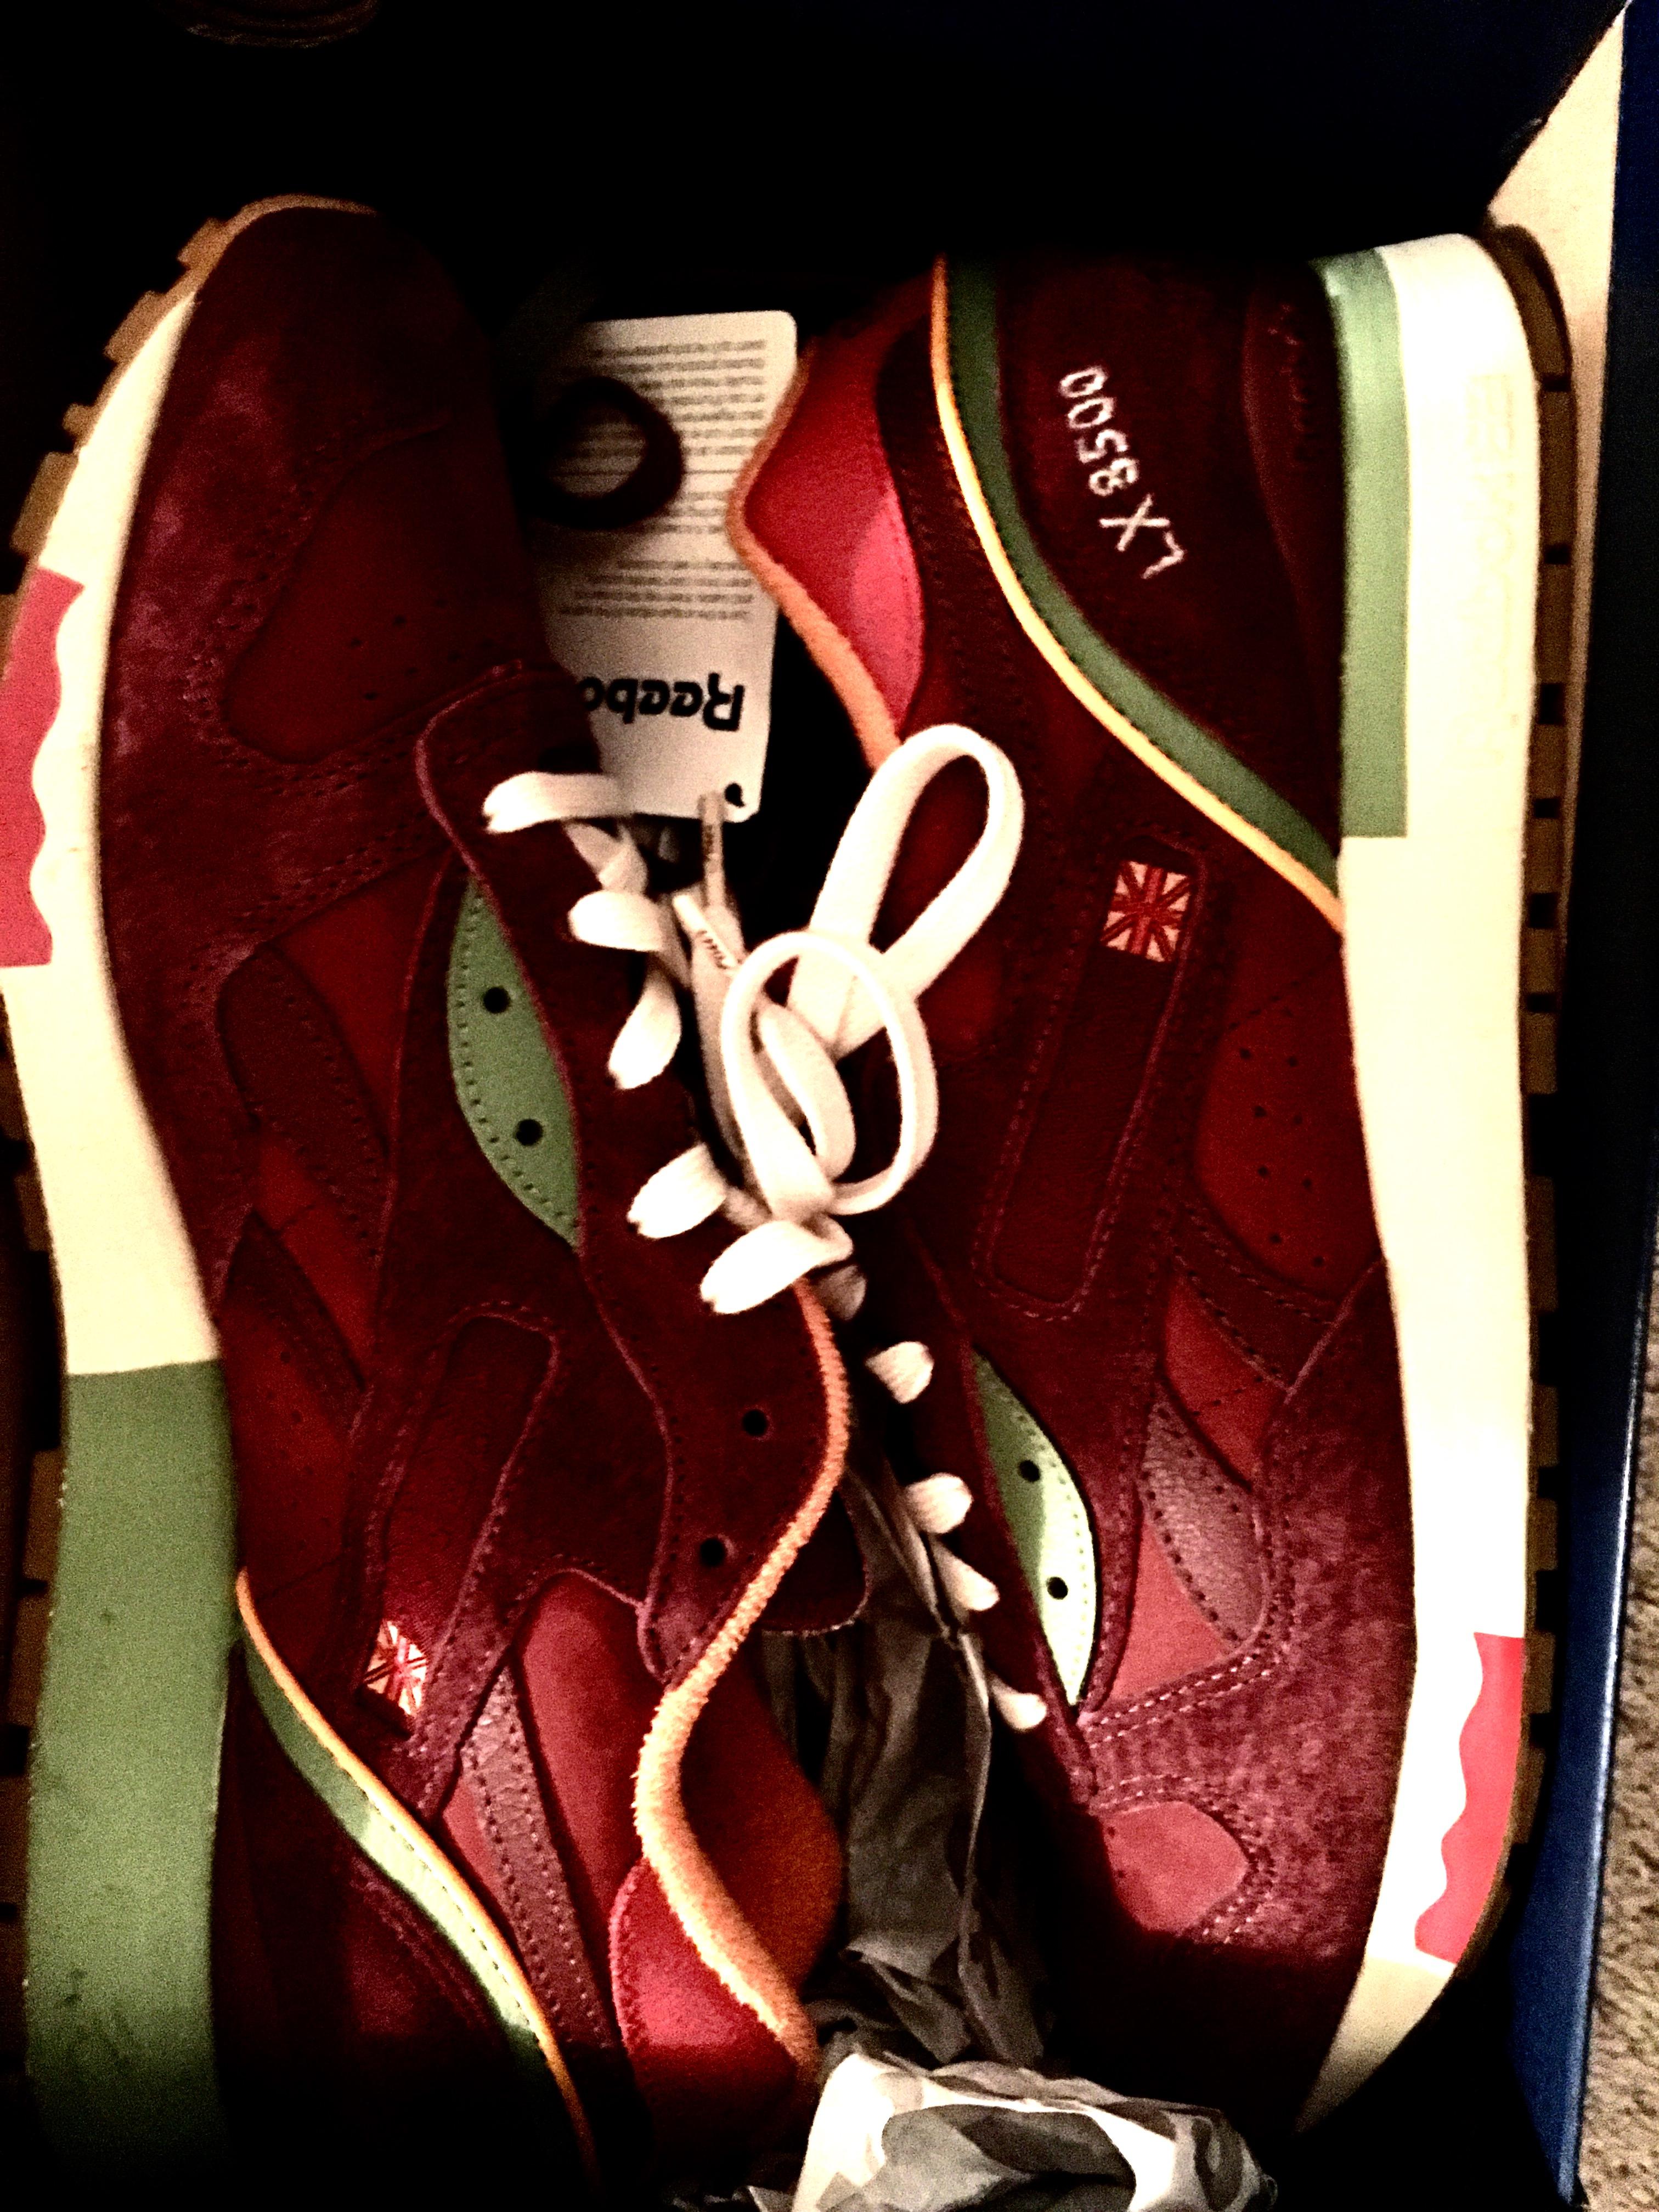 ffc3b759b Reebok Packer Shoes x Reebok LX 8500 Four Seasons Autumn Size 9.5 - Low-Top  Sneakers for Sale - Grailed